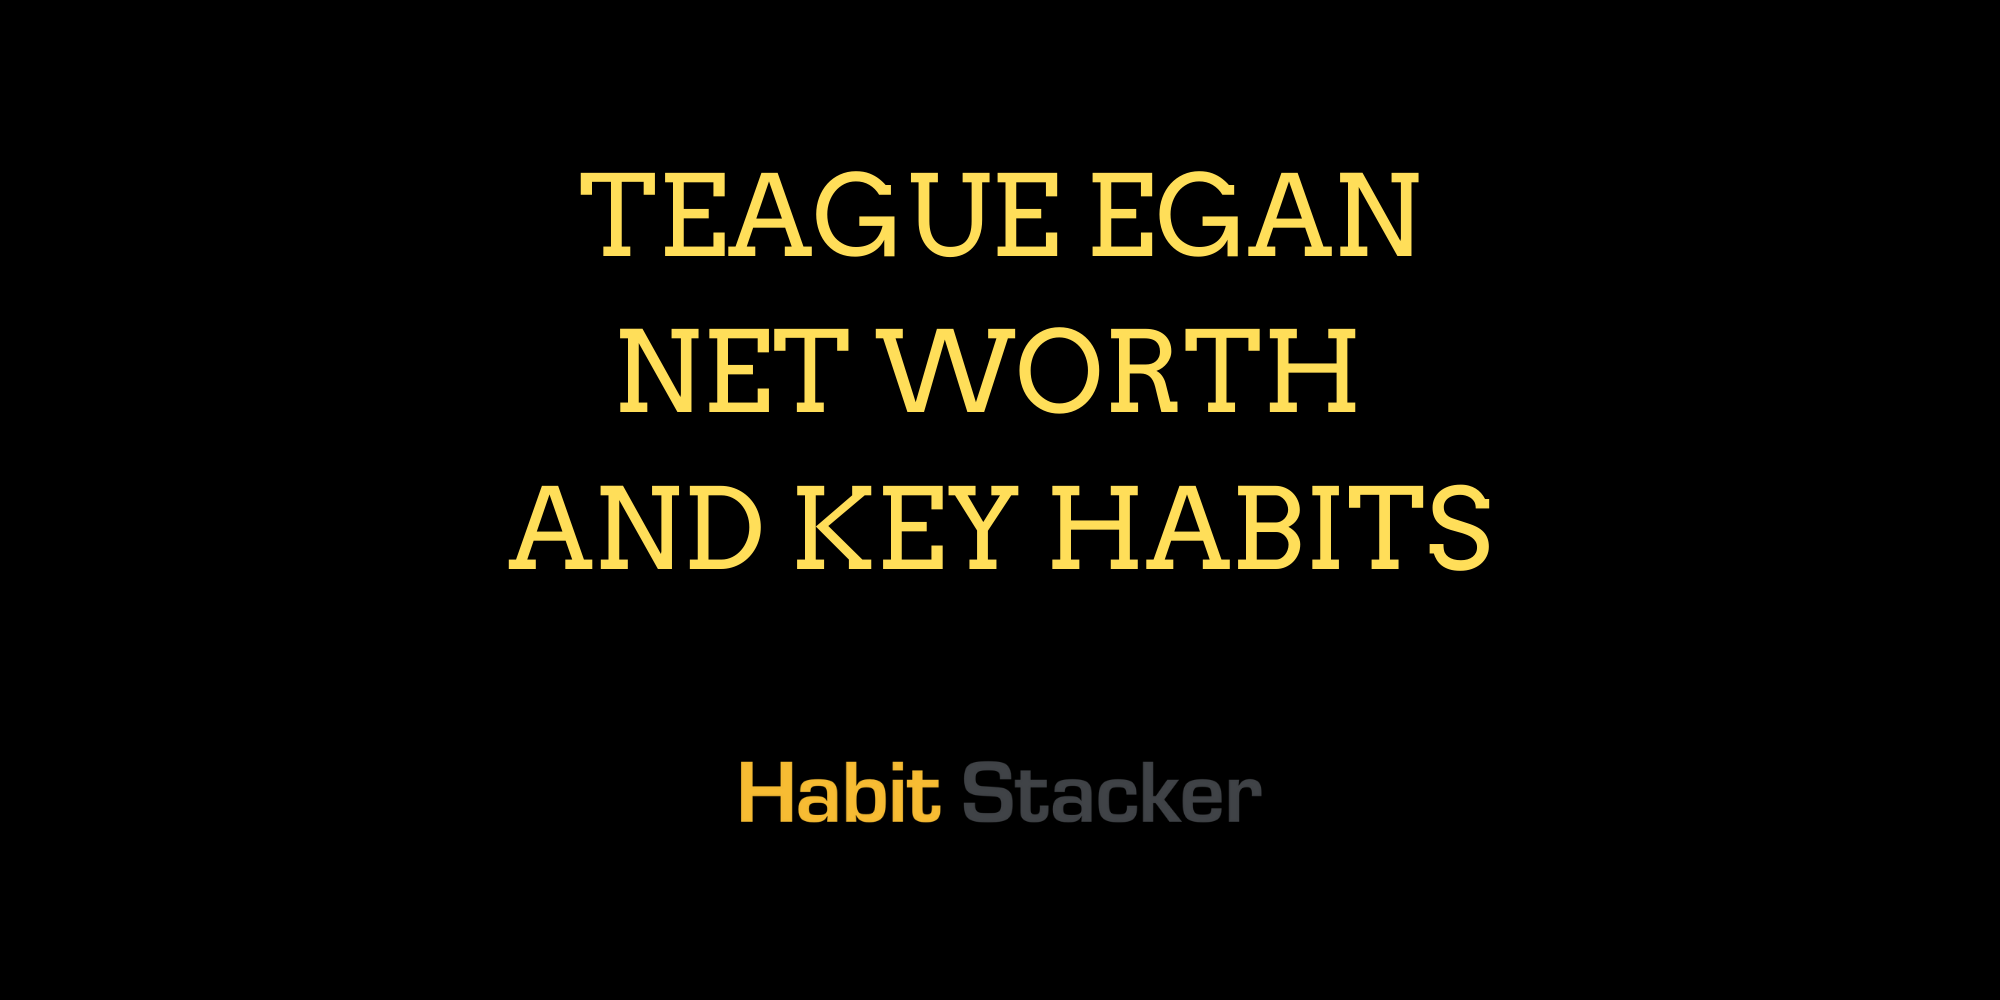 Teague Egan Net Worth